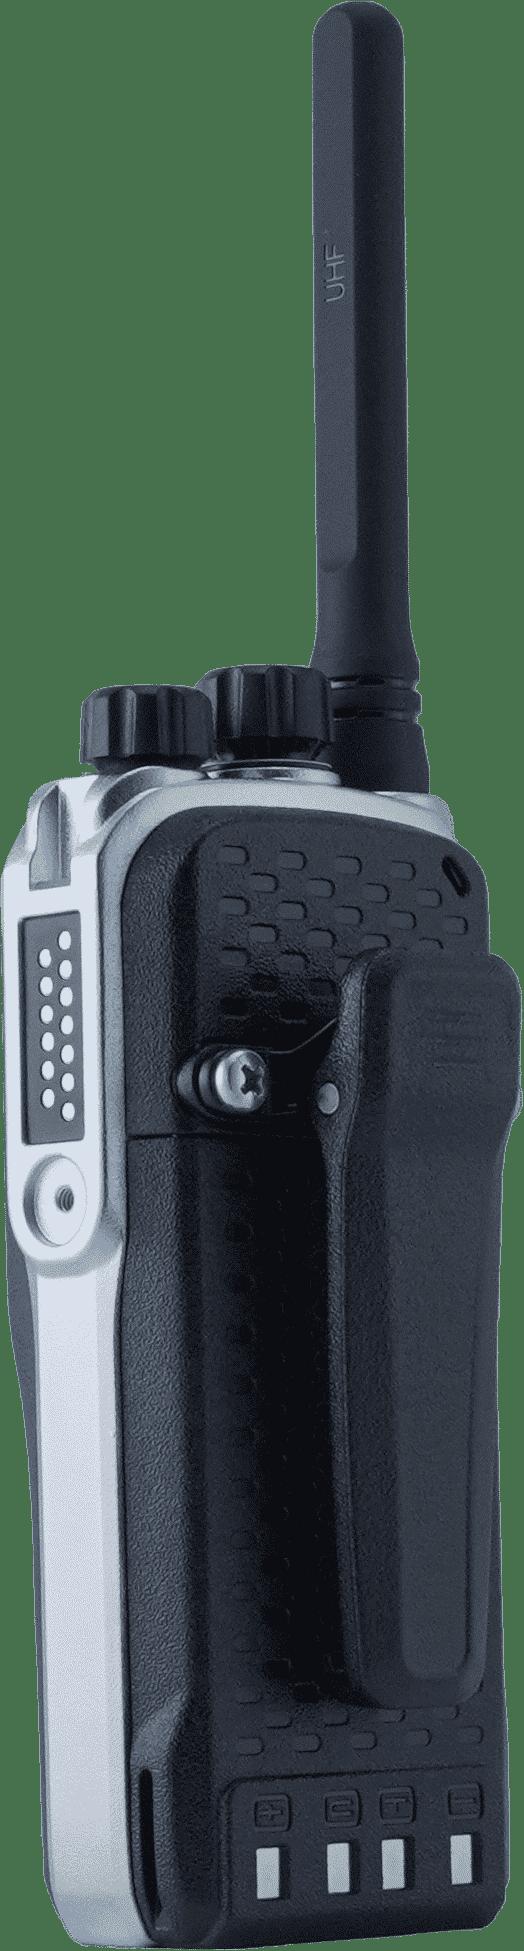 _0006_DigiX-Link-DMR-Digital-Portable-Radio-Back-2